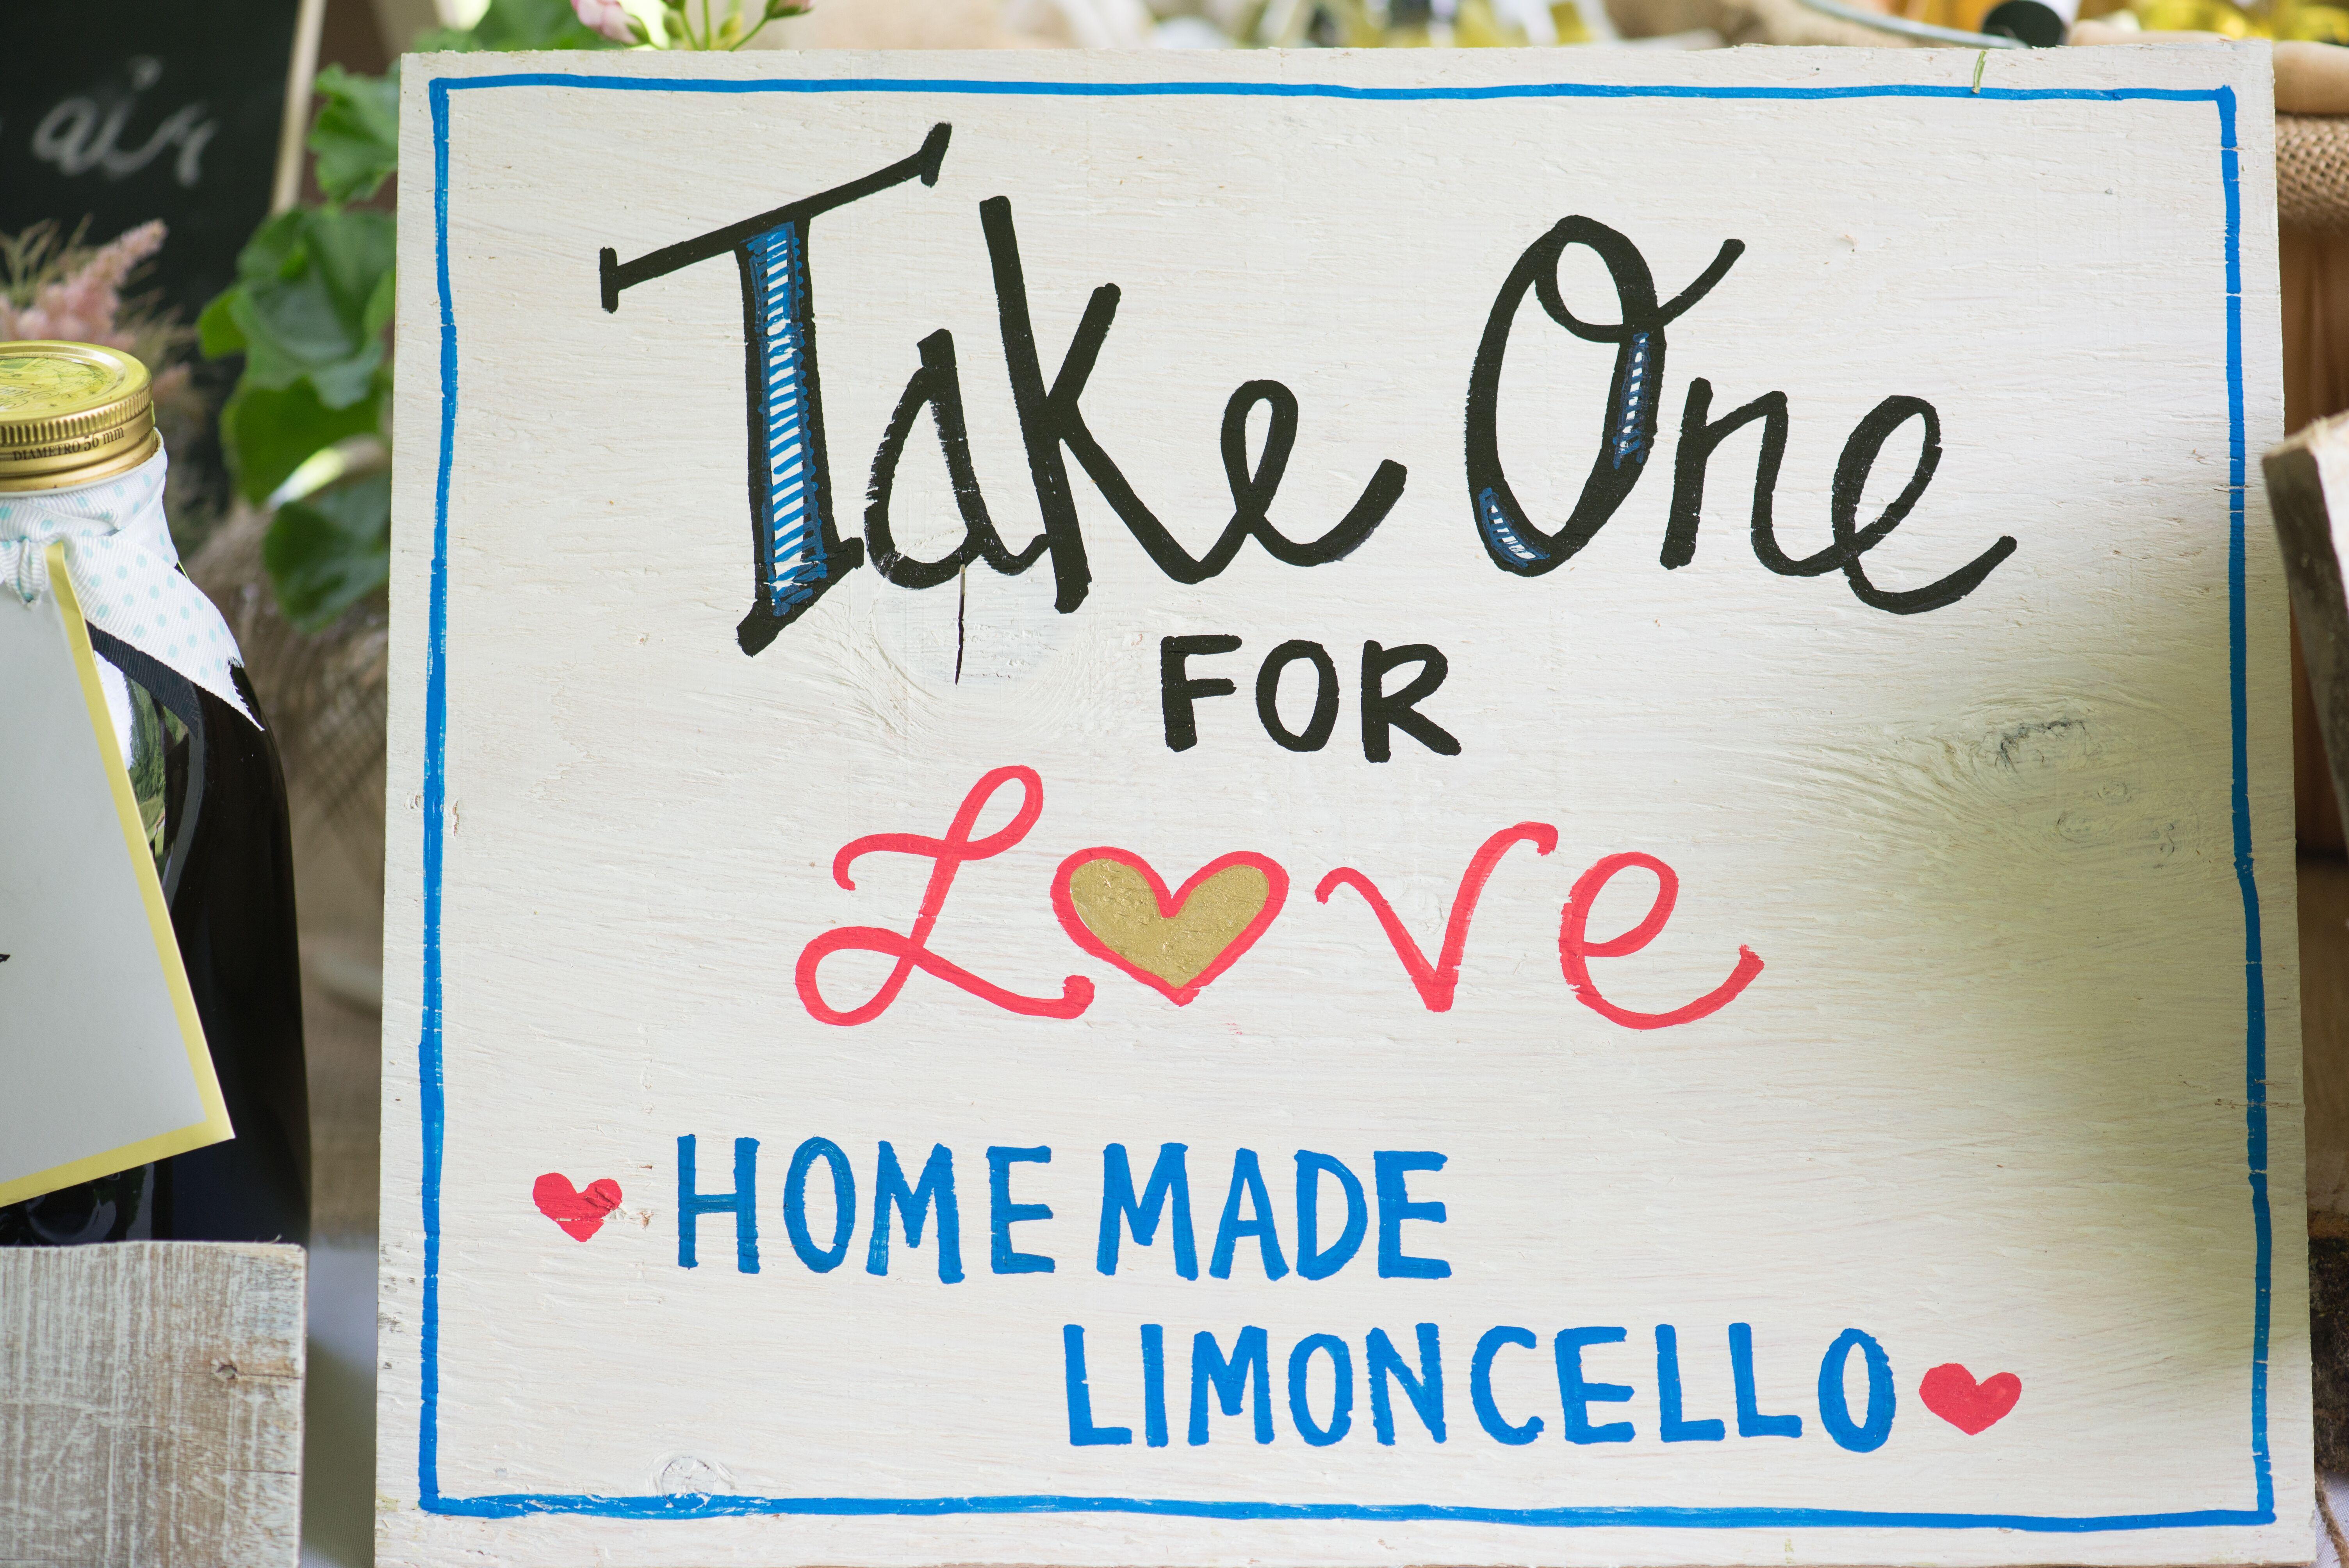 Thank You Sign Wedding Limoncello Limoncello Favor Sign Printable, Grazie Sign Limoncello Favor Please Take One Instant Download